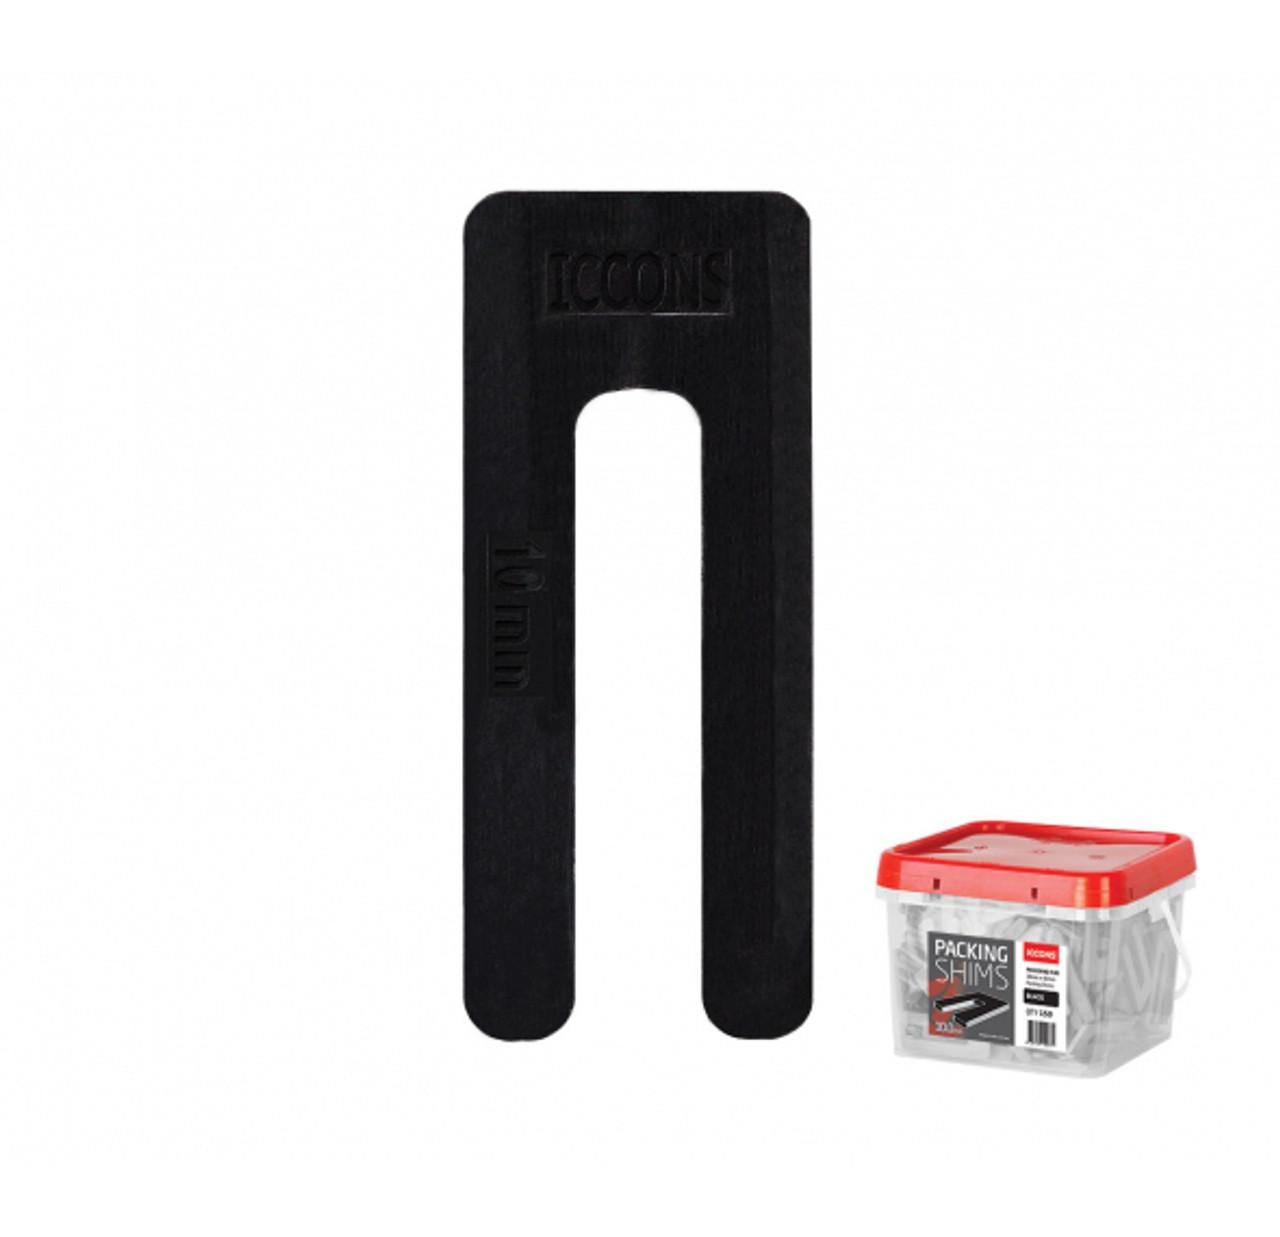 WINDOW PACKER - SHIM TUB ICCONS 5.0mm x 75mm 400pce RED